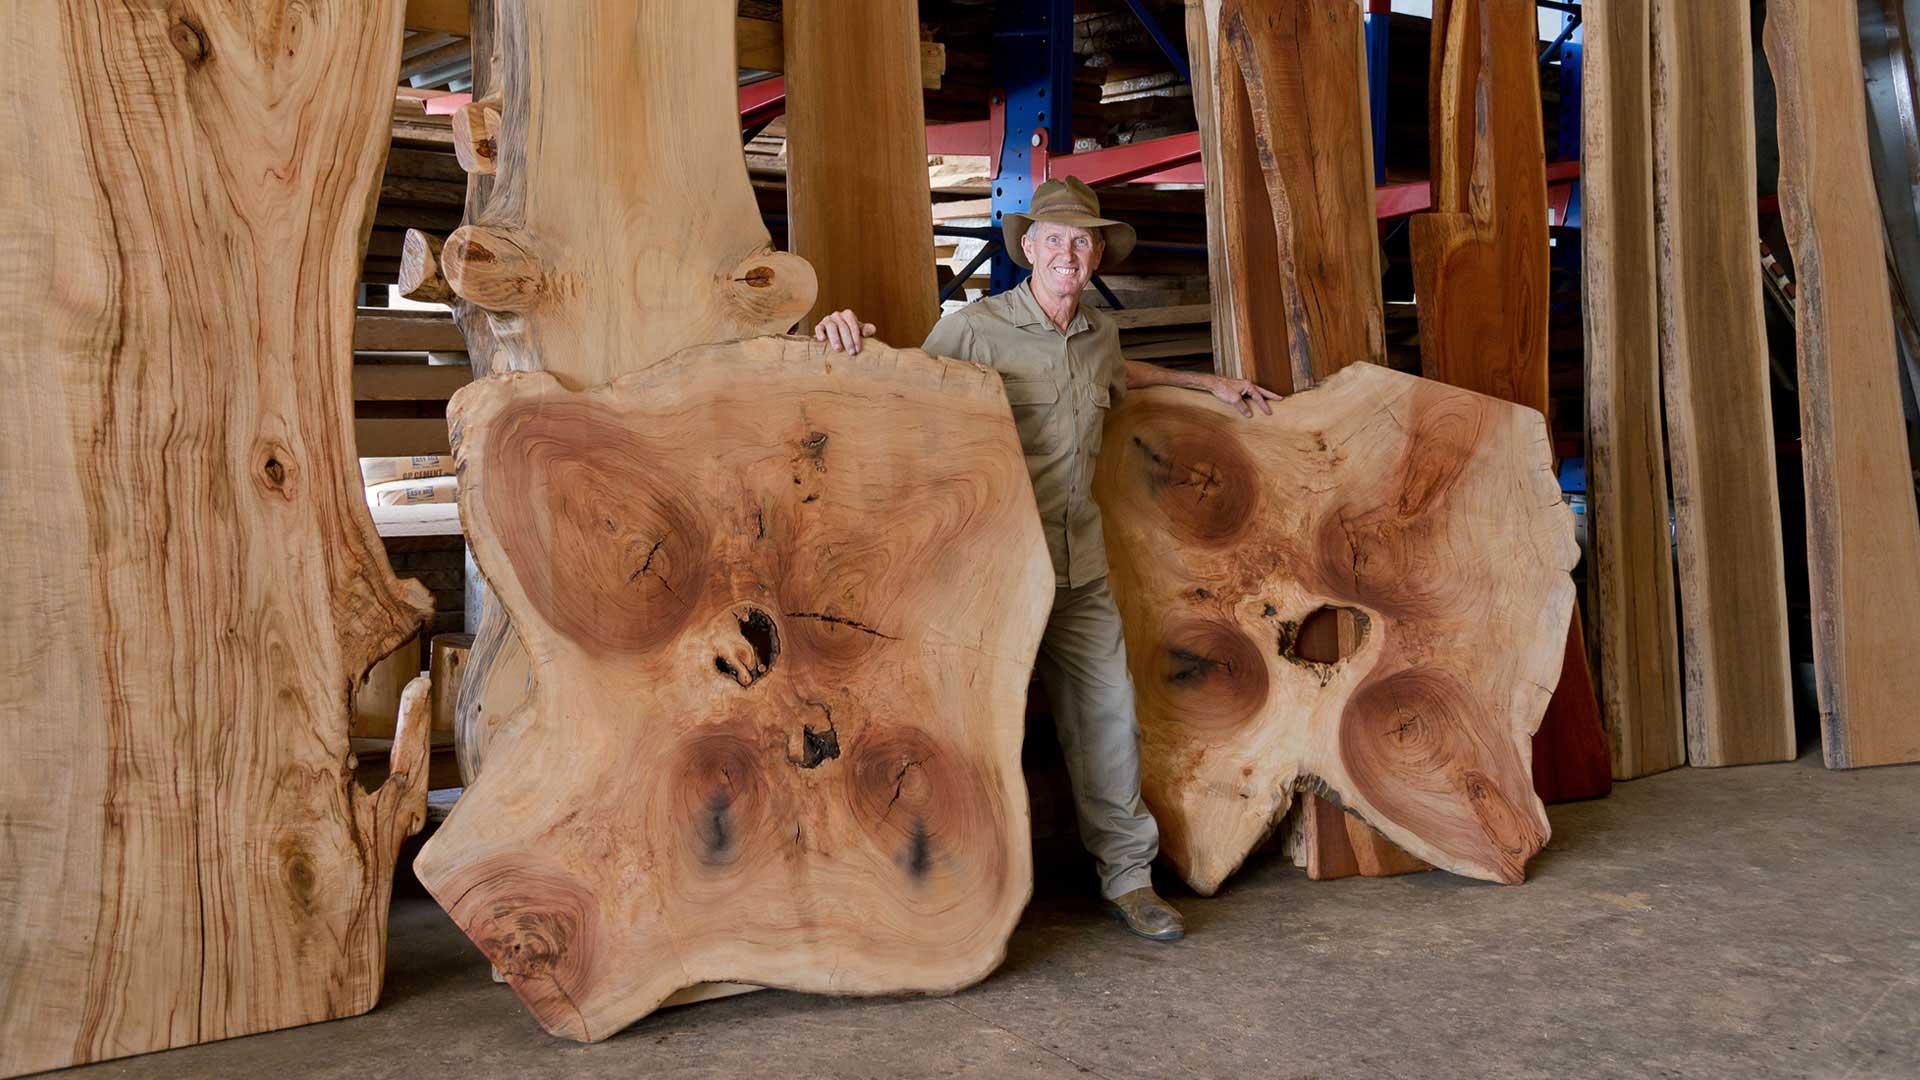 Home - image Amazing-Timber-Slabs-Tradeware-Building-Supplies-189kb on https://tradewarebuildingsupplies.com